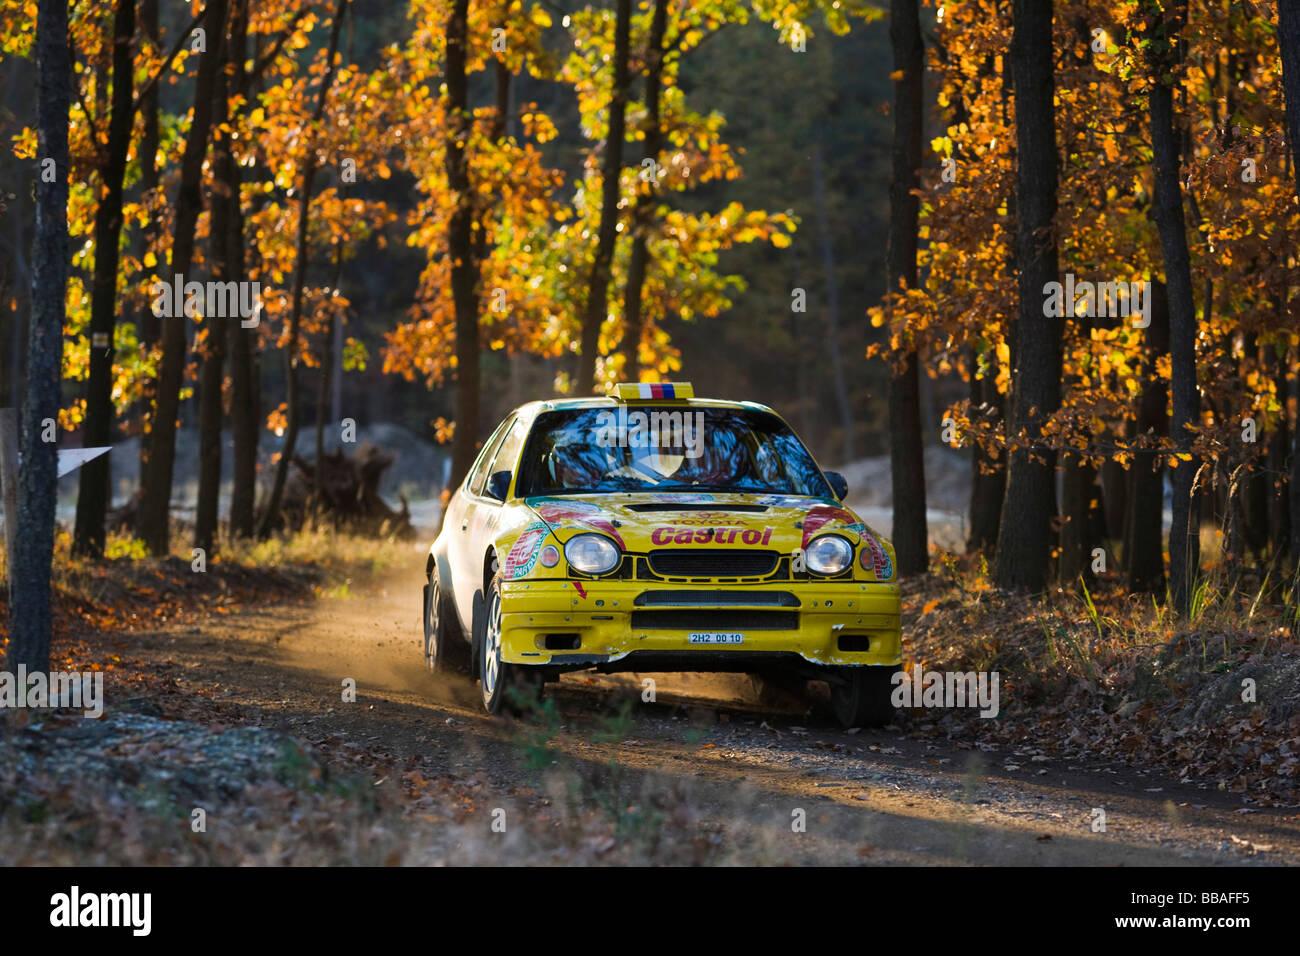 Toyota Corolla WRC, Lausitz Rally, motorsports, Saxony, Germany, Europe - Stock Image